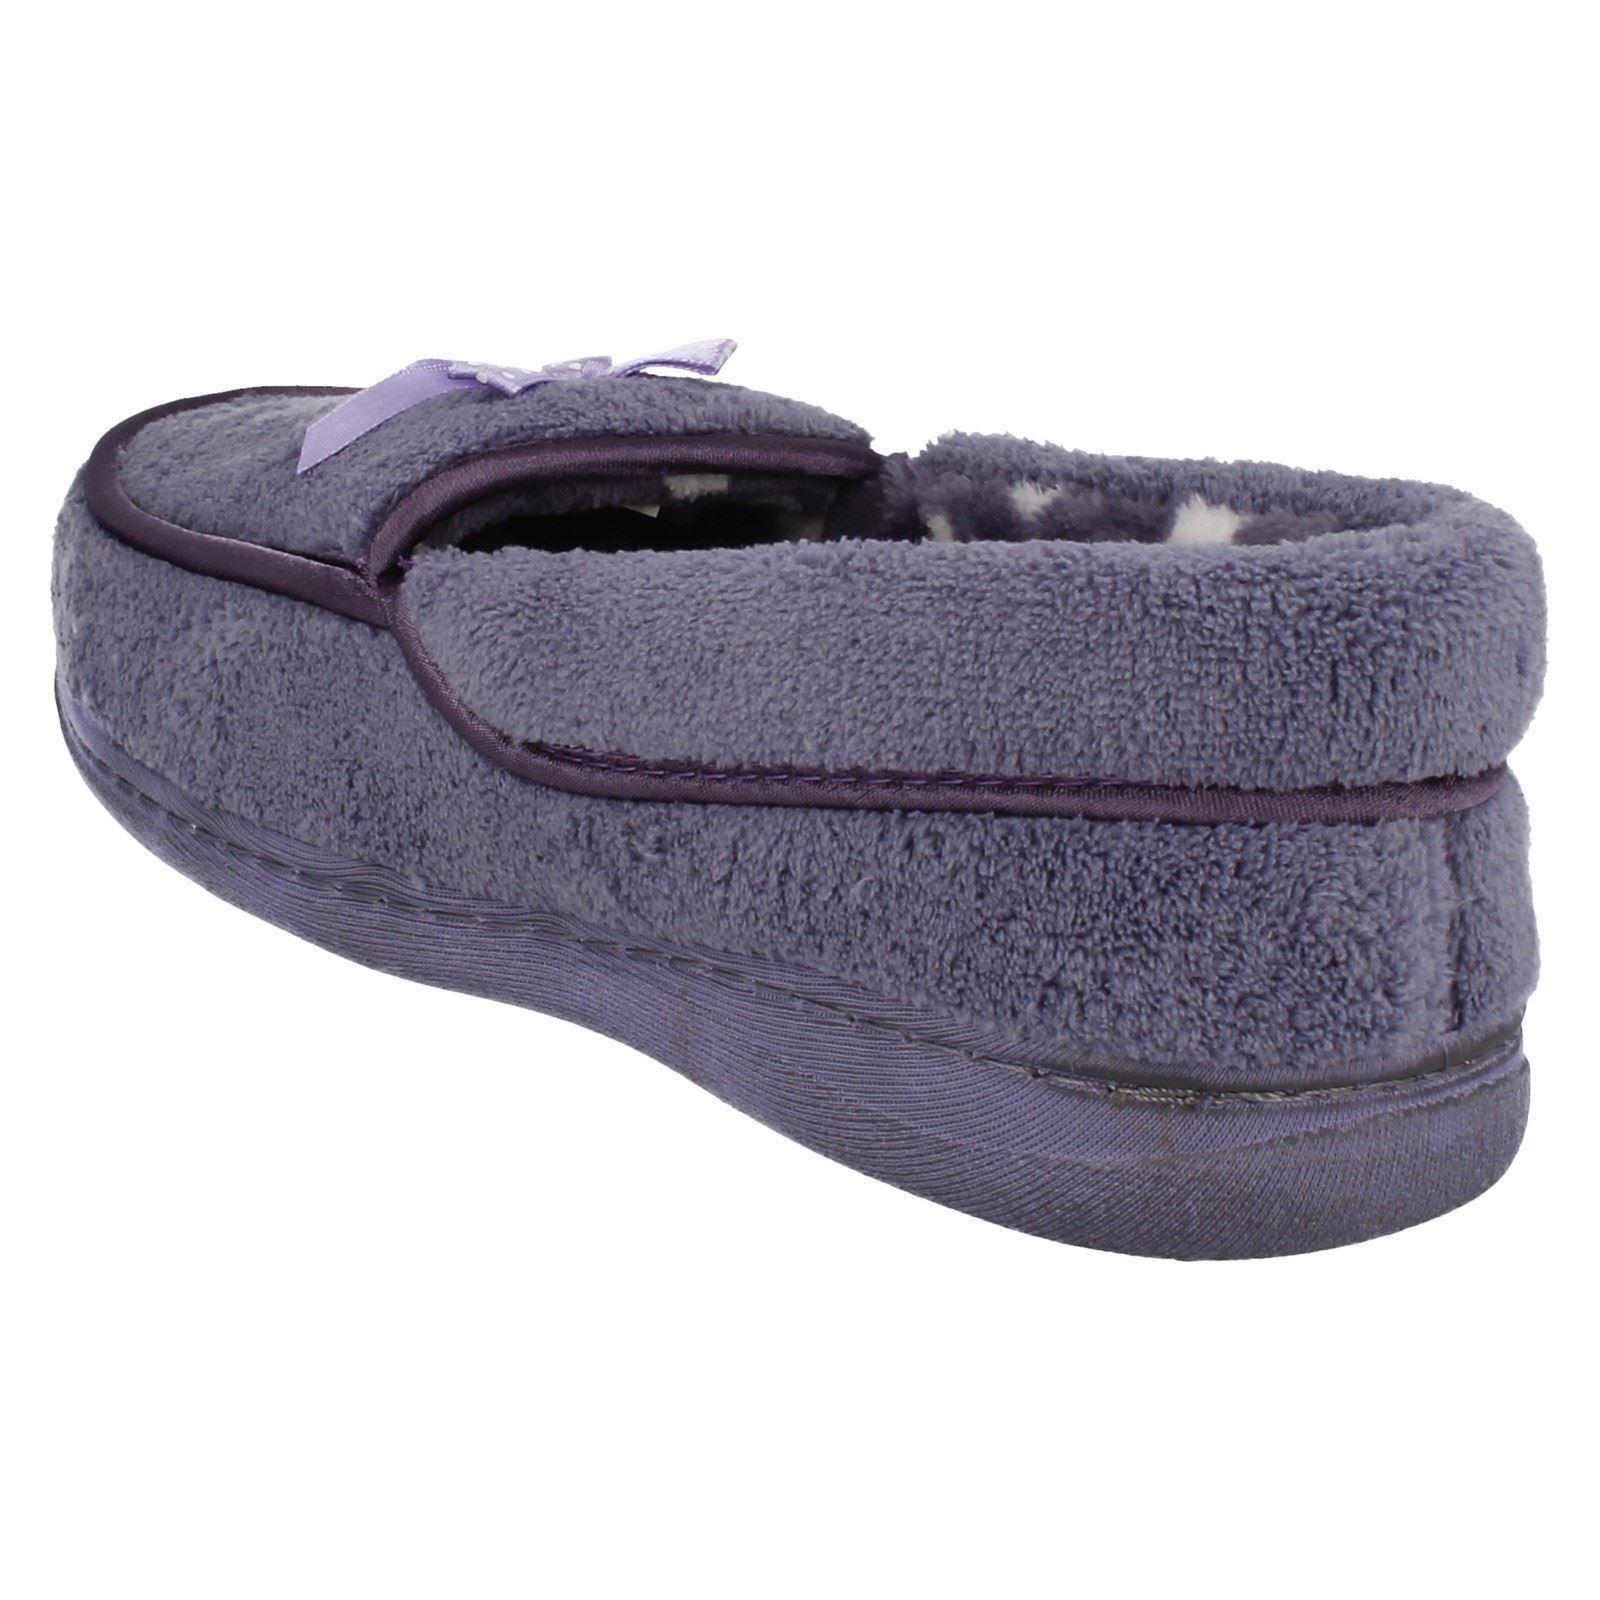 Señoras Jyoti Textil Resbalón en Zapatillas * Riva *